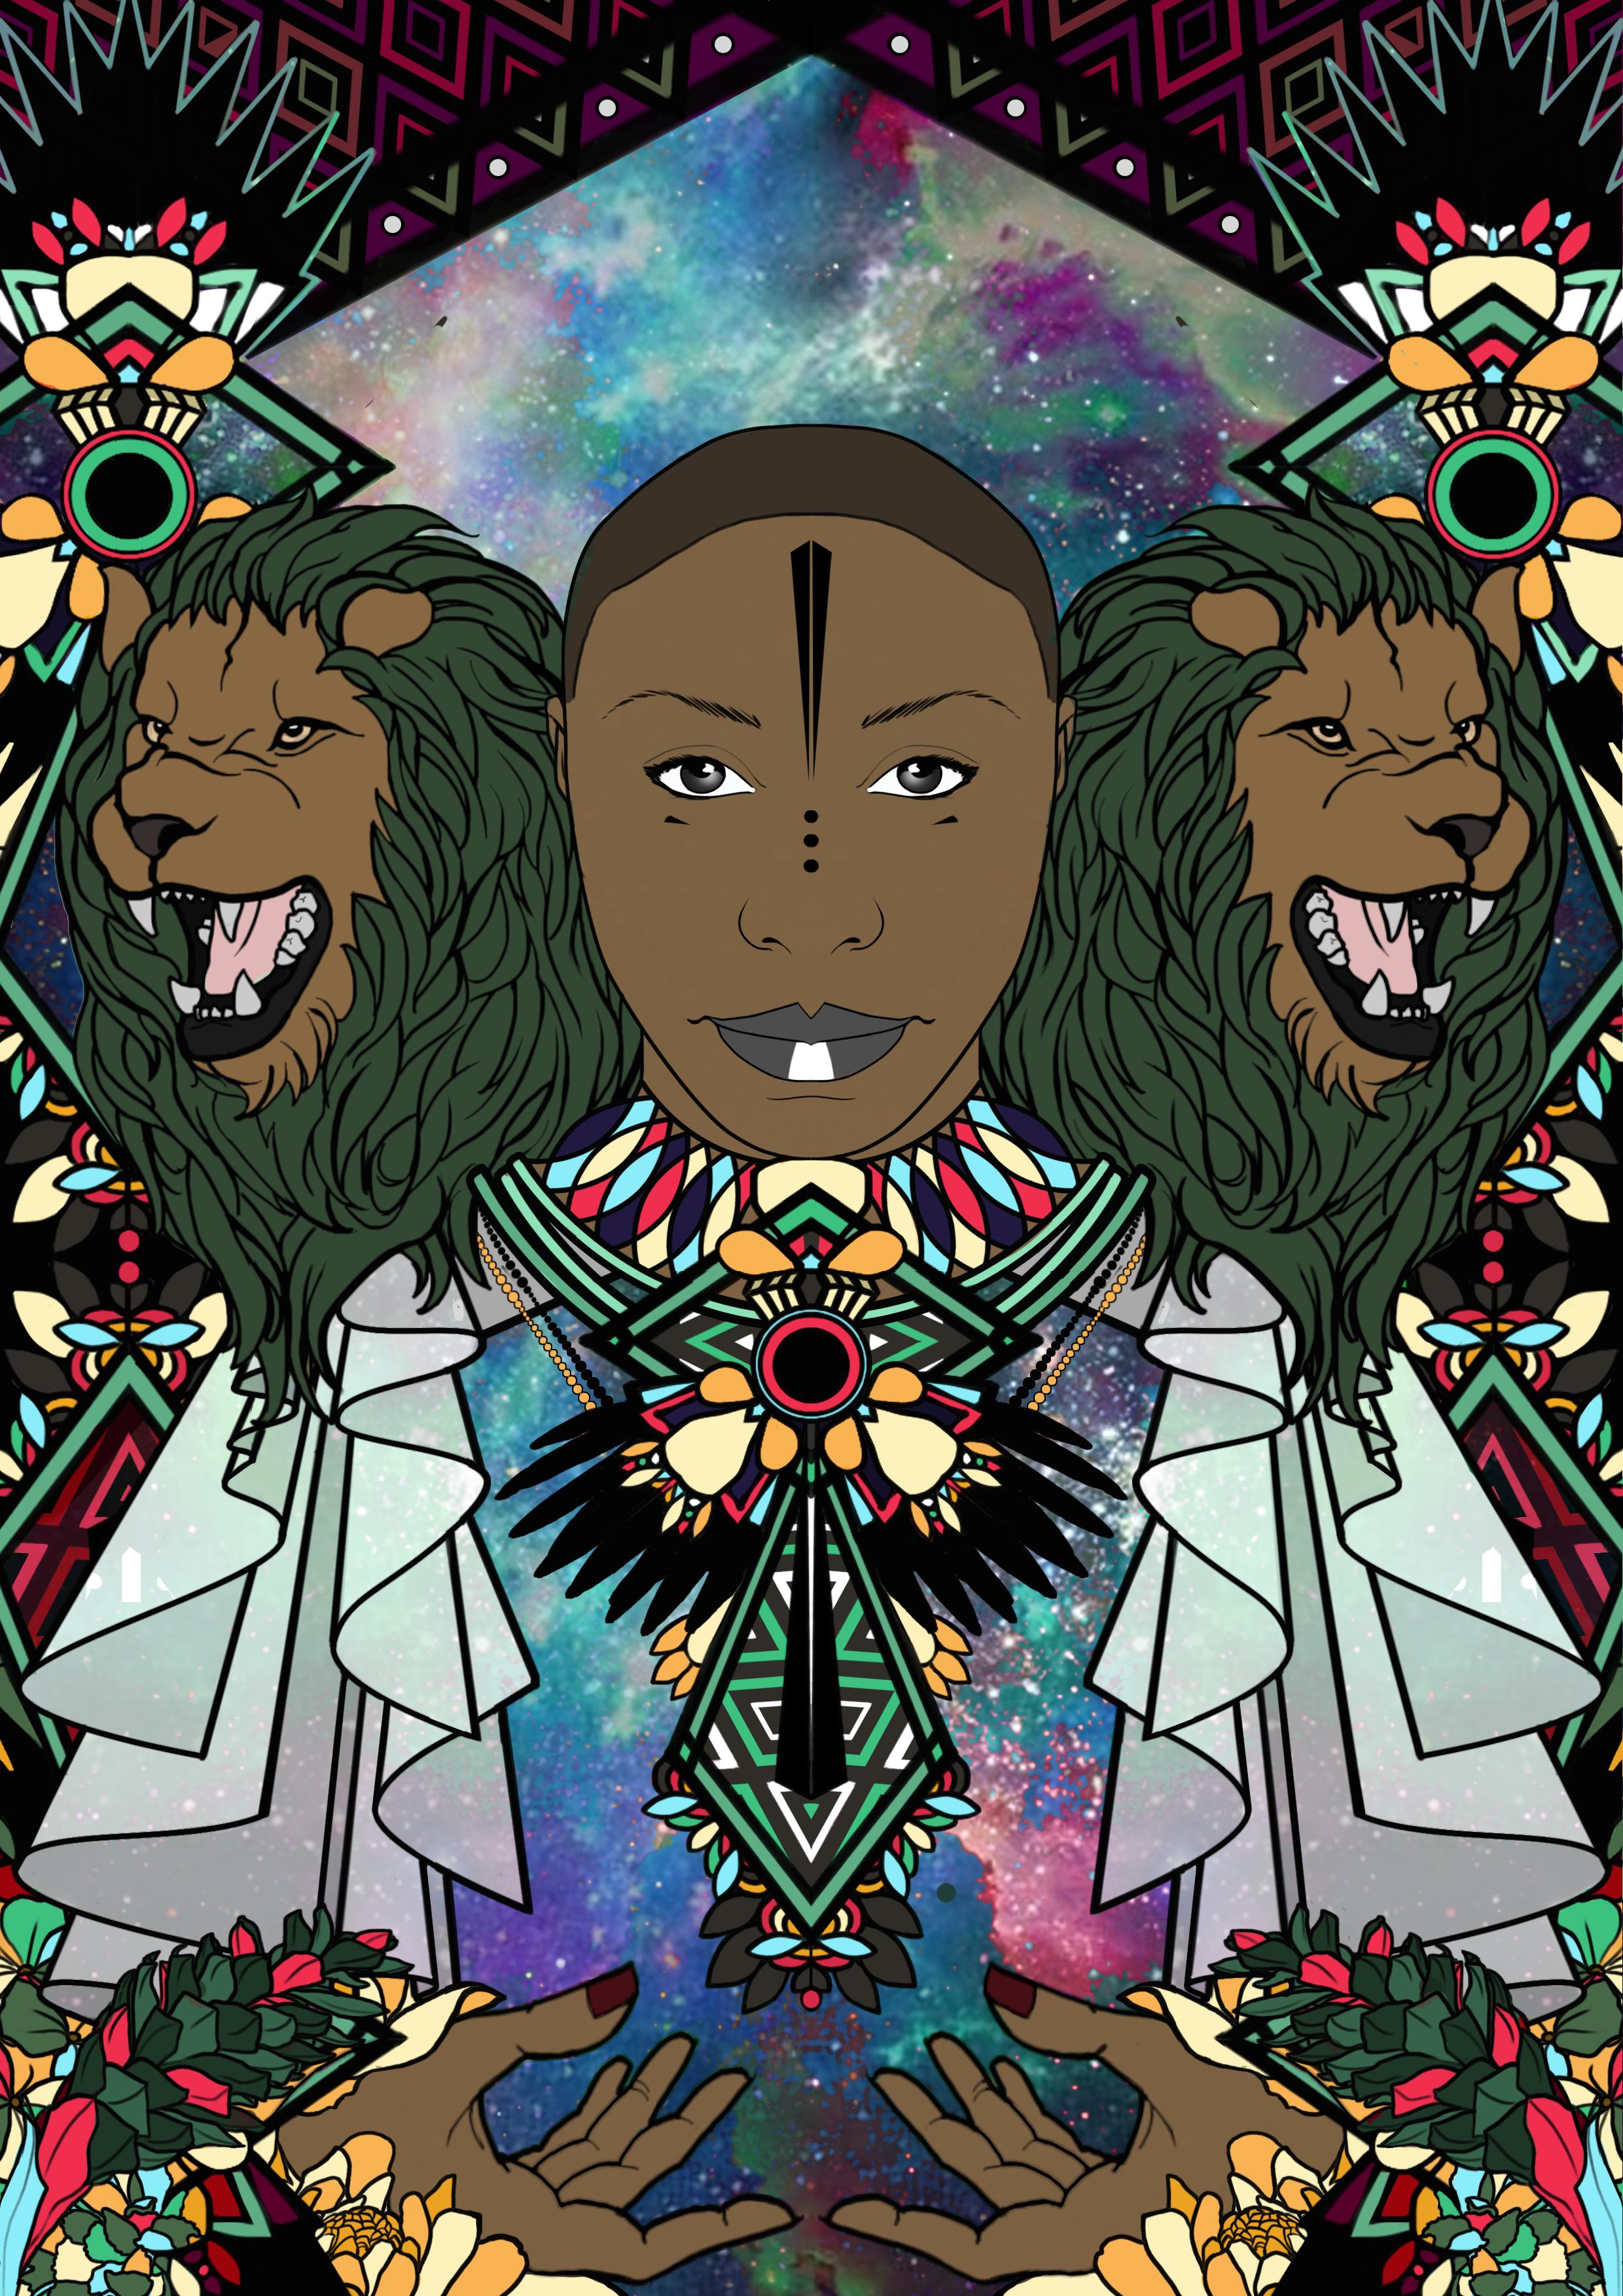 Laura mvula Illustration Design